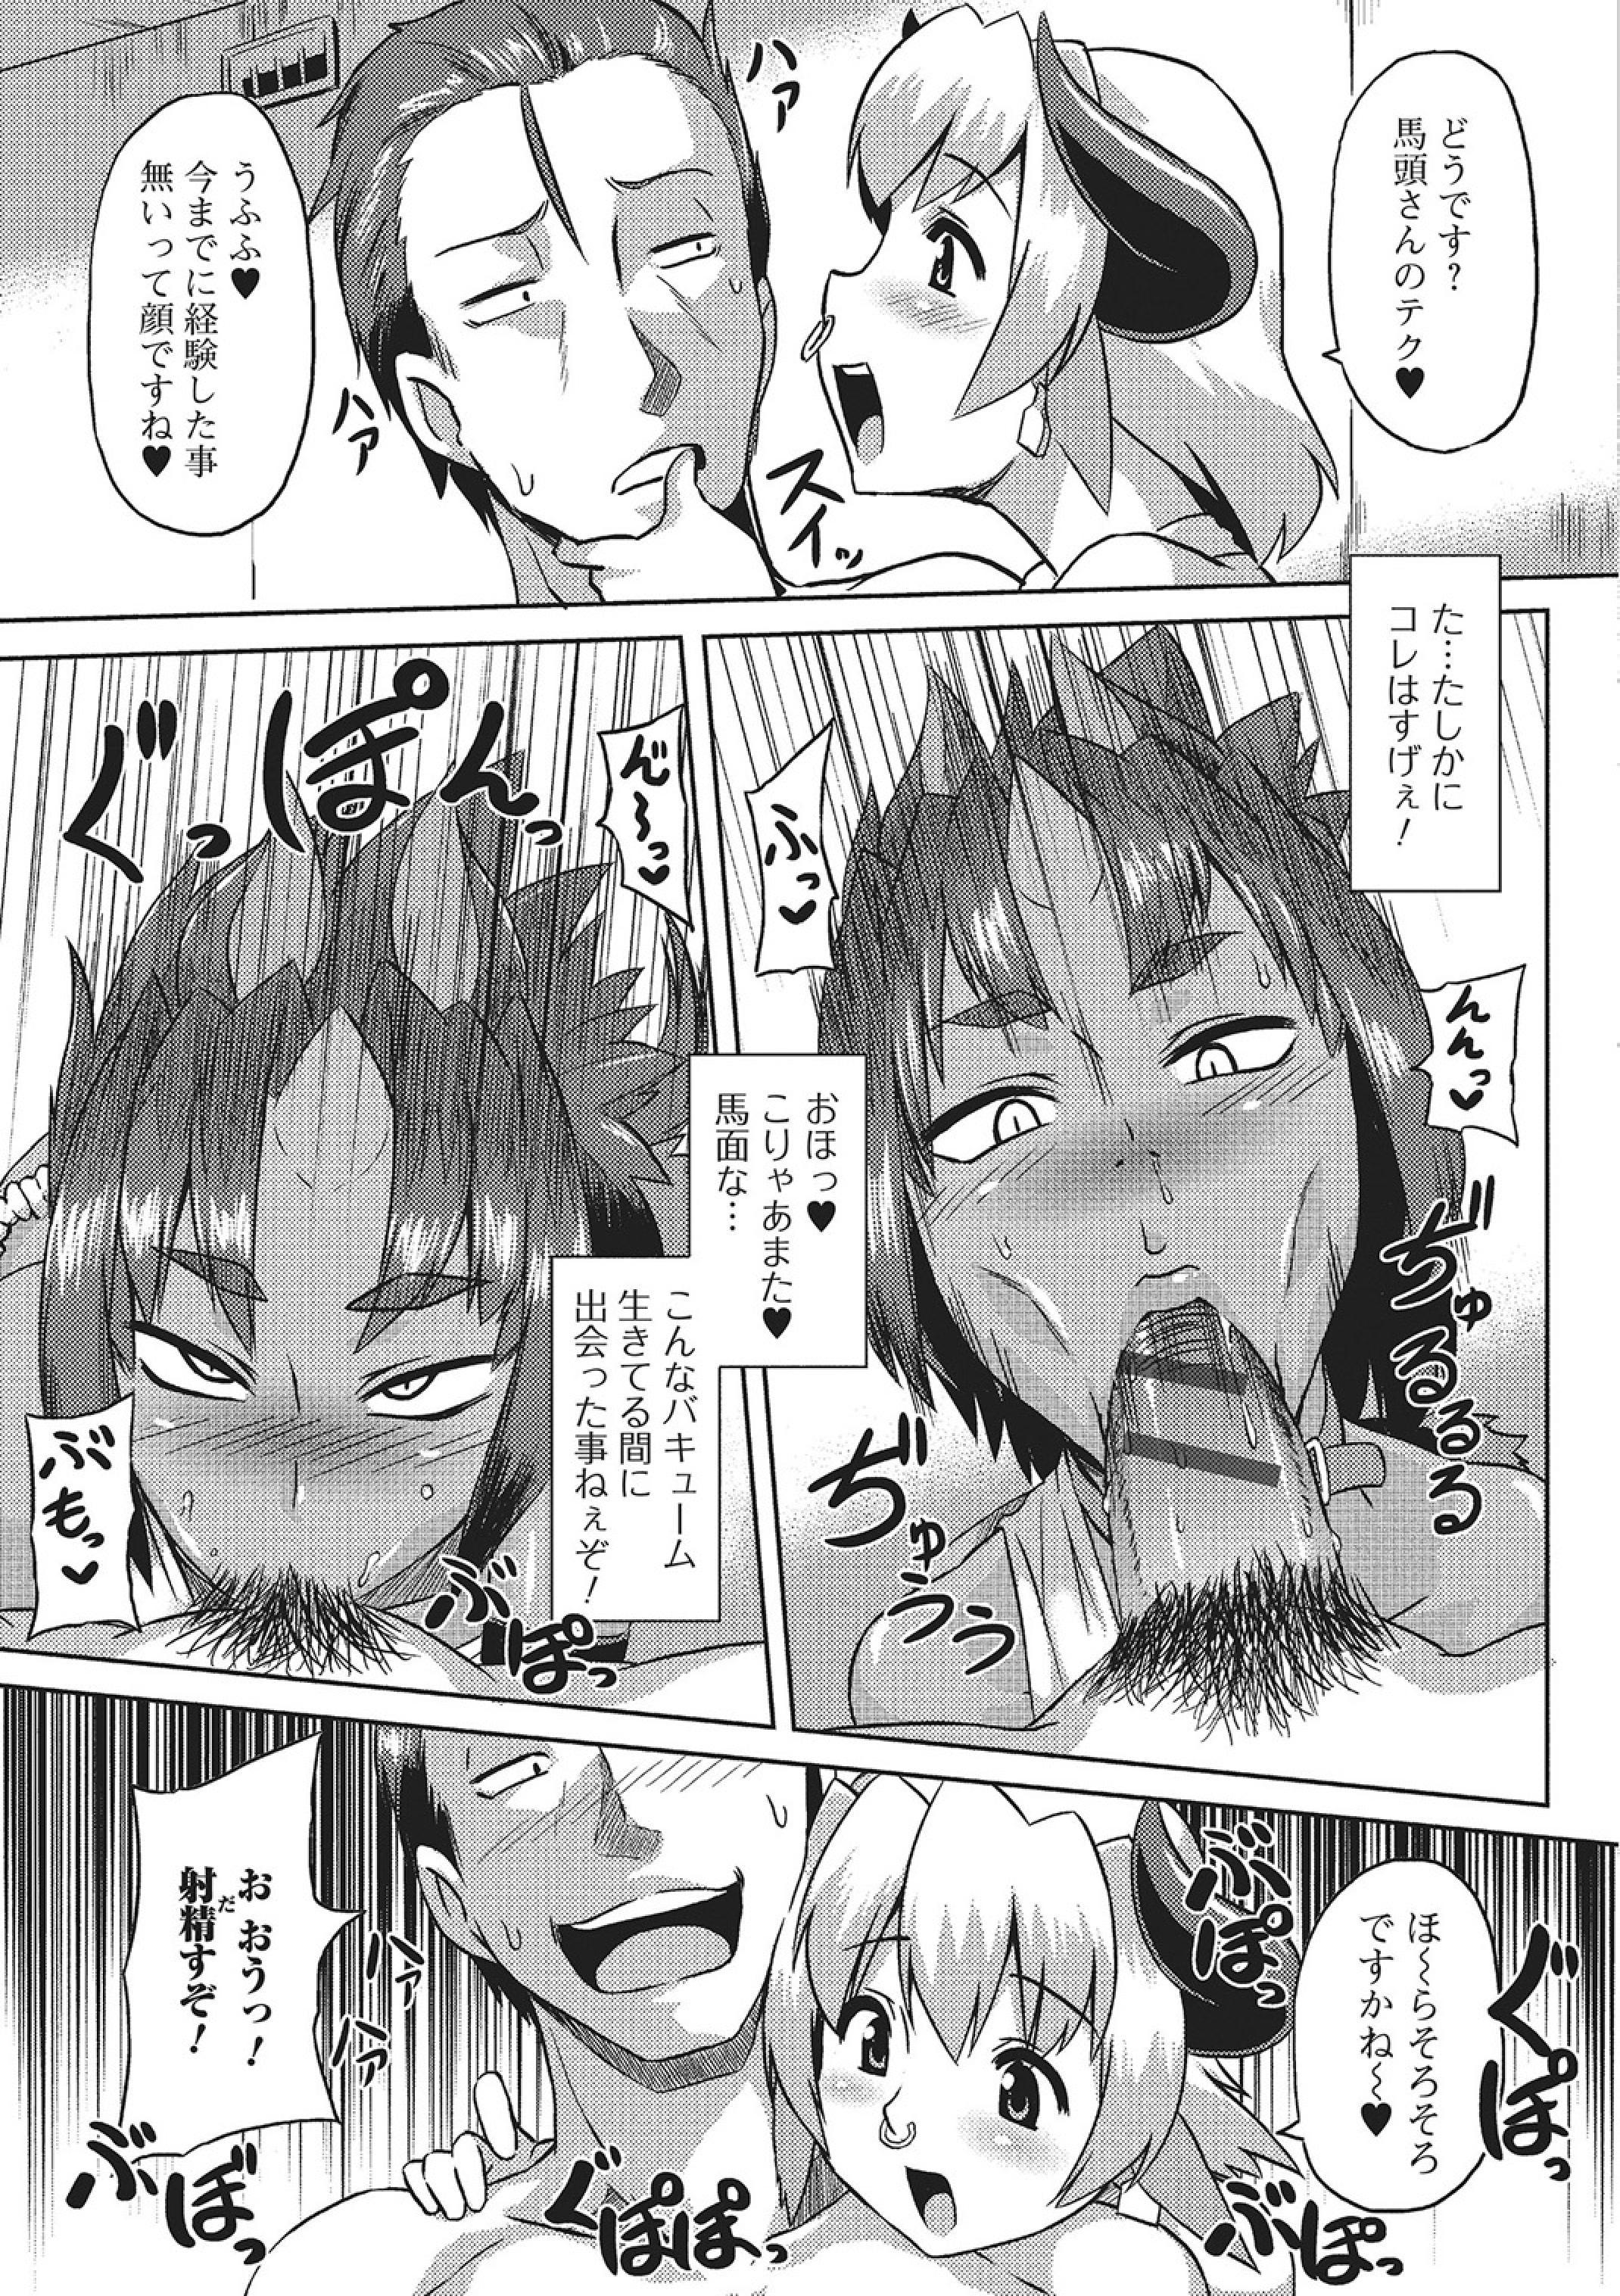 Monster Shoujo e no Yokujou 91